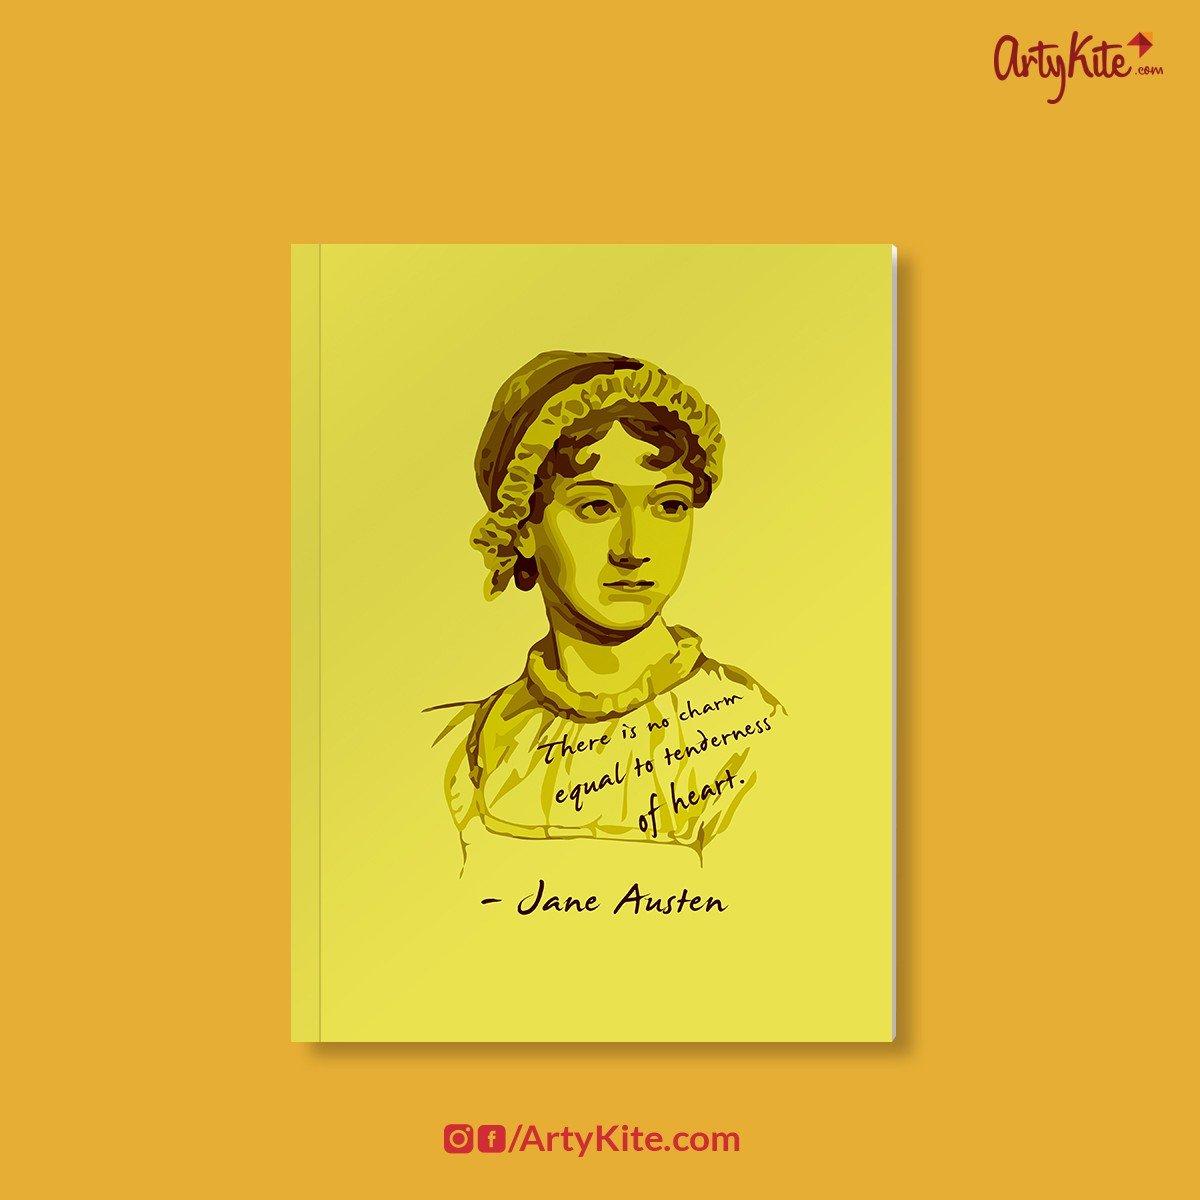 southam critical essays on jane austen Get this from a library critical essays on jane austen [b c southam].